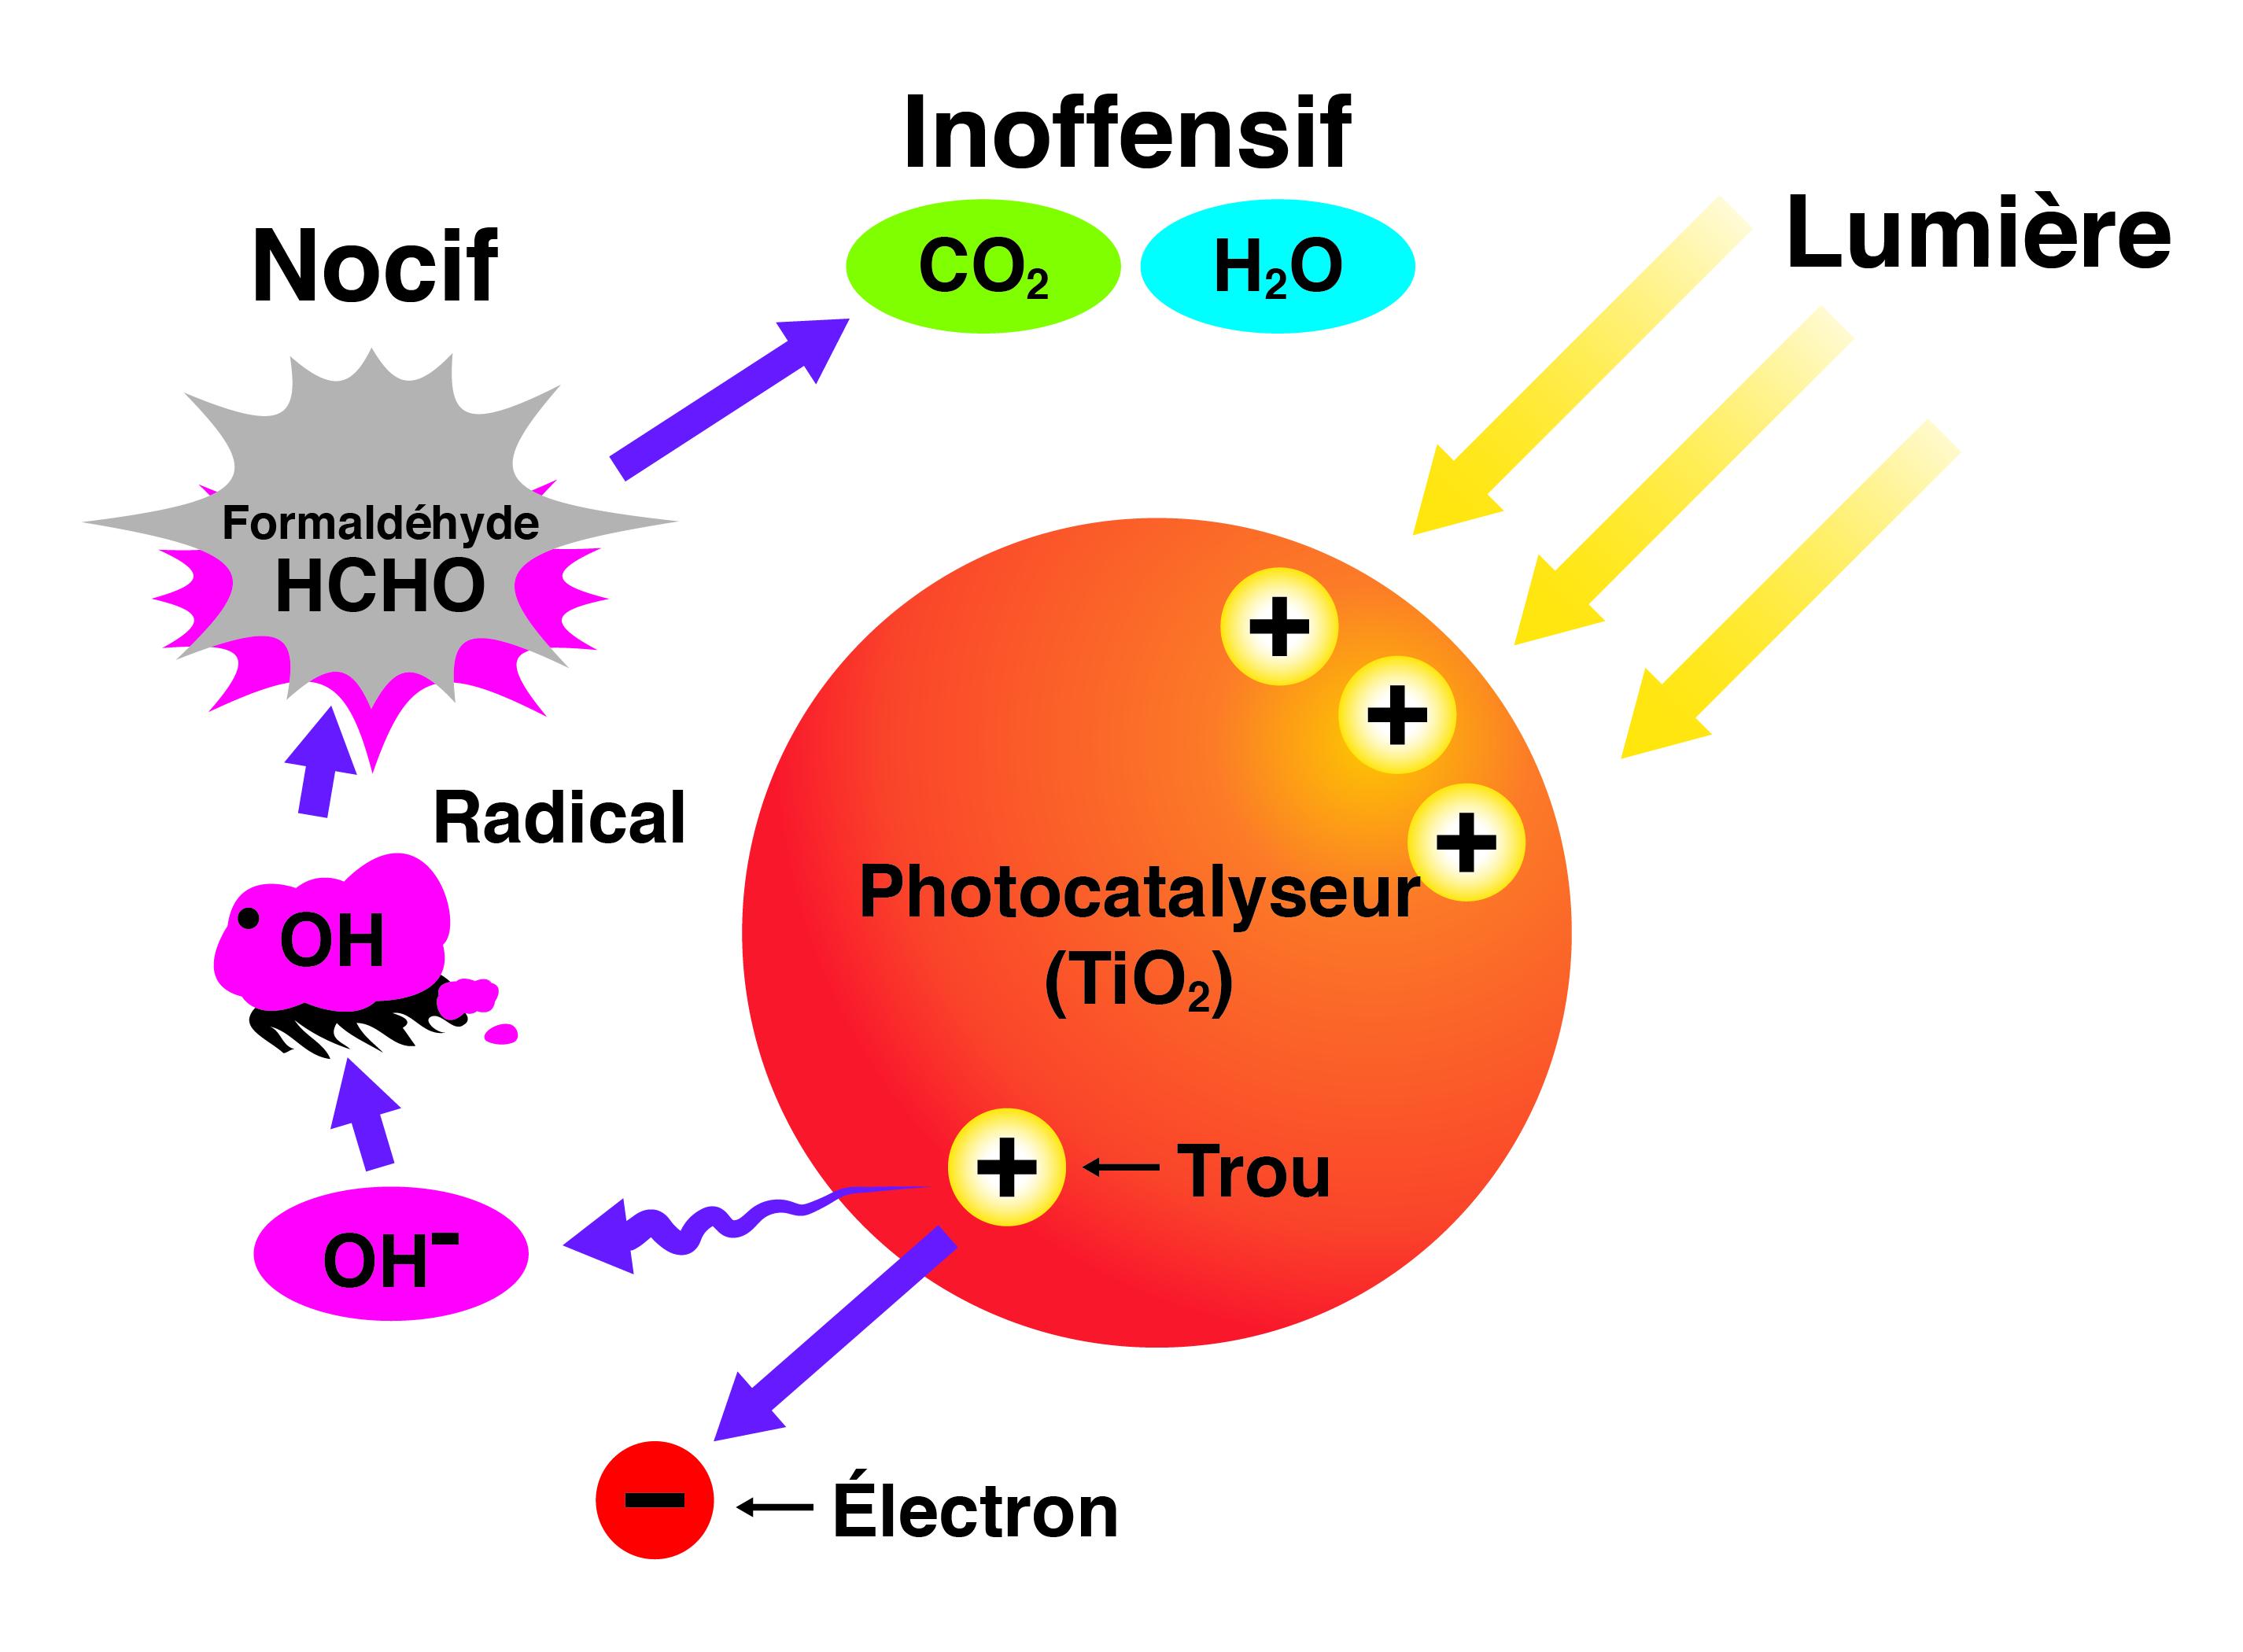 light_chemical_decomposition-fr-may2019-v01